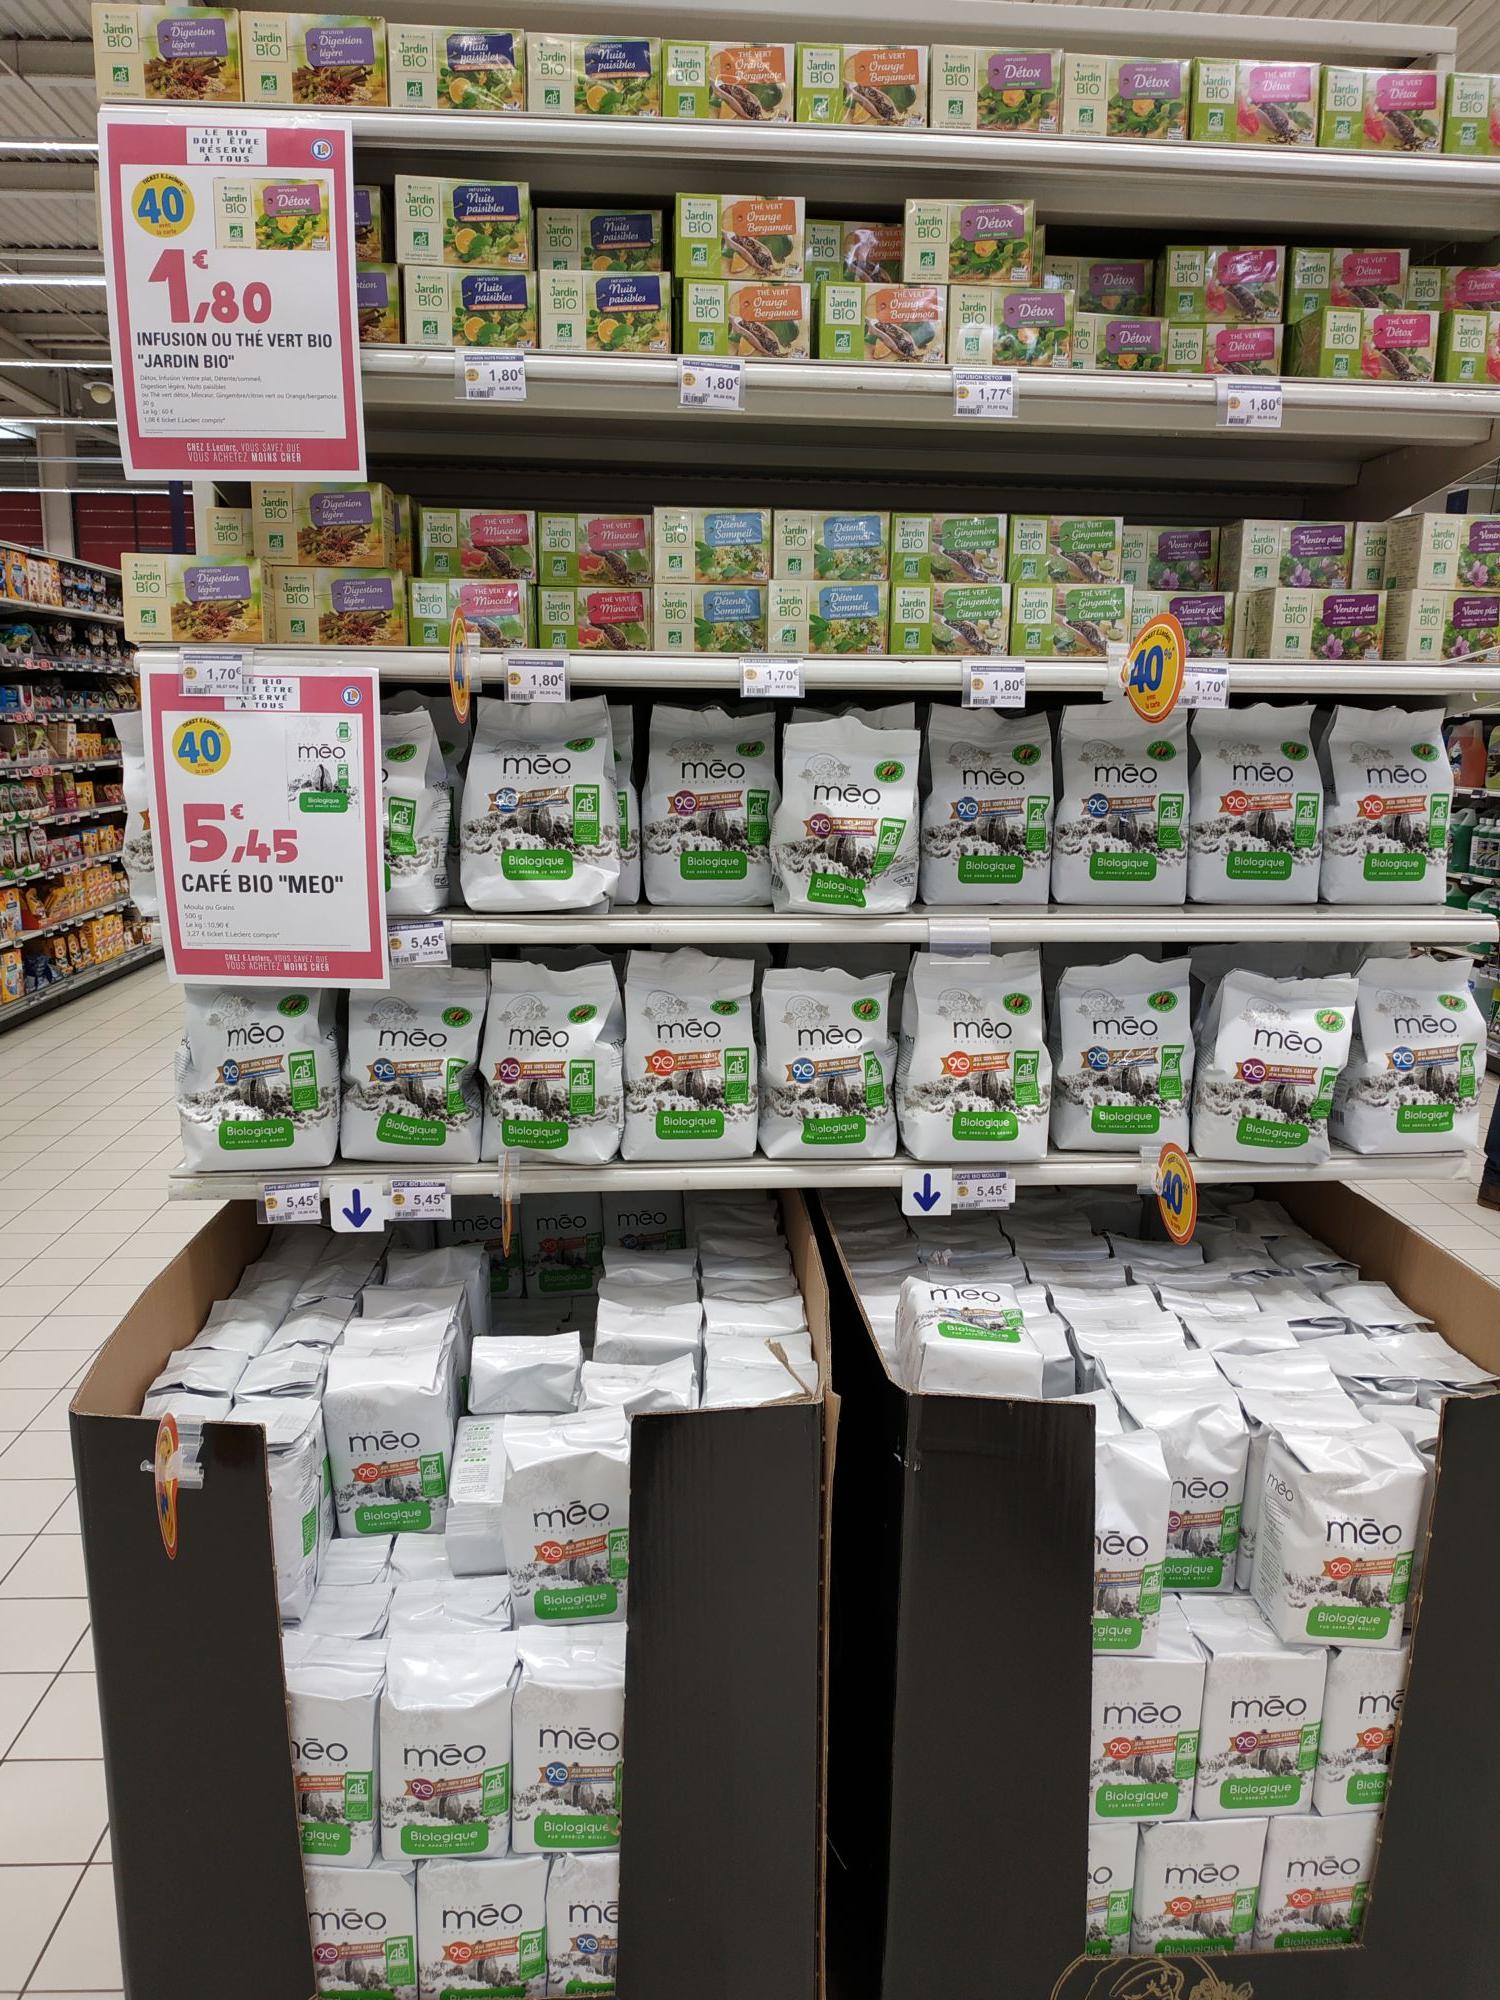 Paquet de Café Meo Bio 500g (moulu ou en grain) - Cleunay (35)